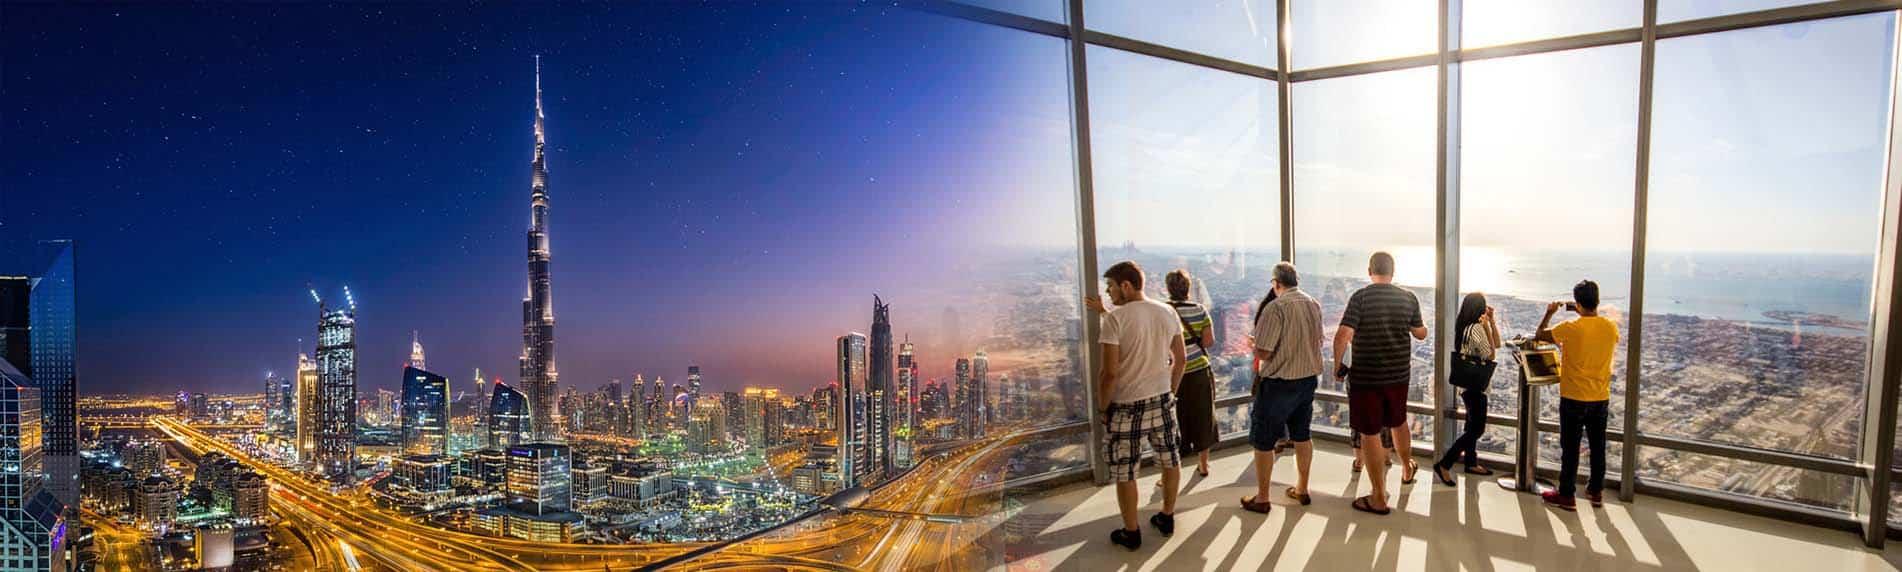 rak burj khalifa tour